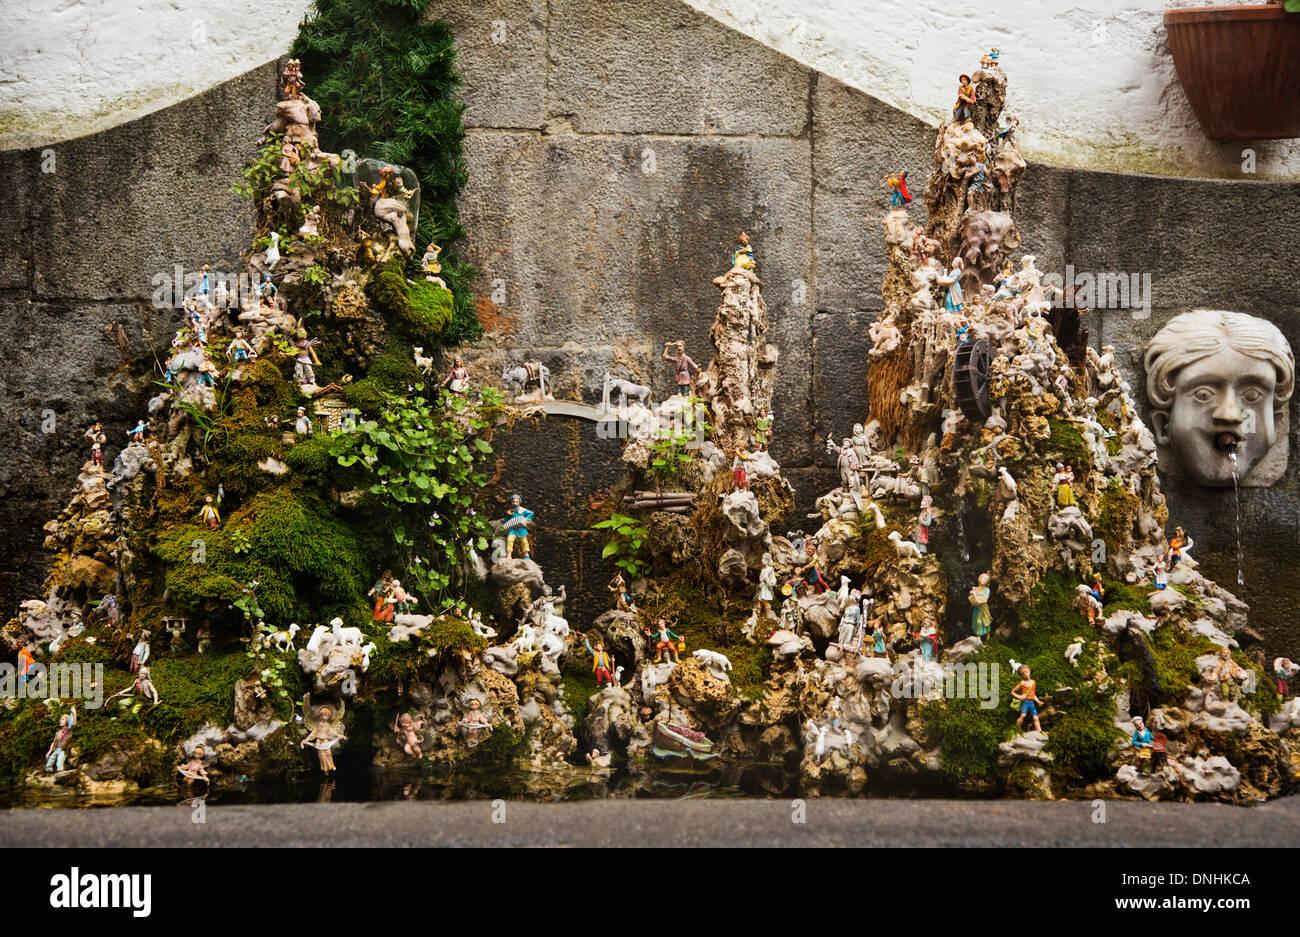 Fontana in miniatura, Amalfi, provincia di Salerno, Campania, Italia Foto Stock